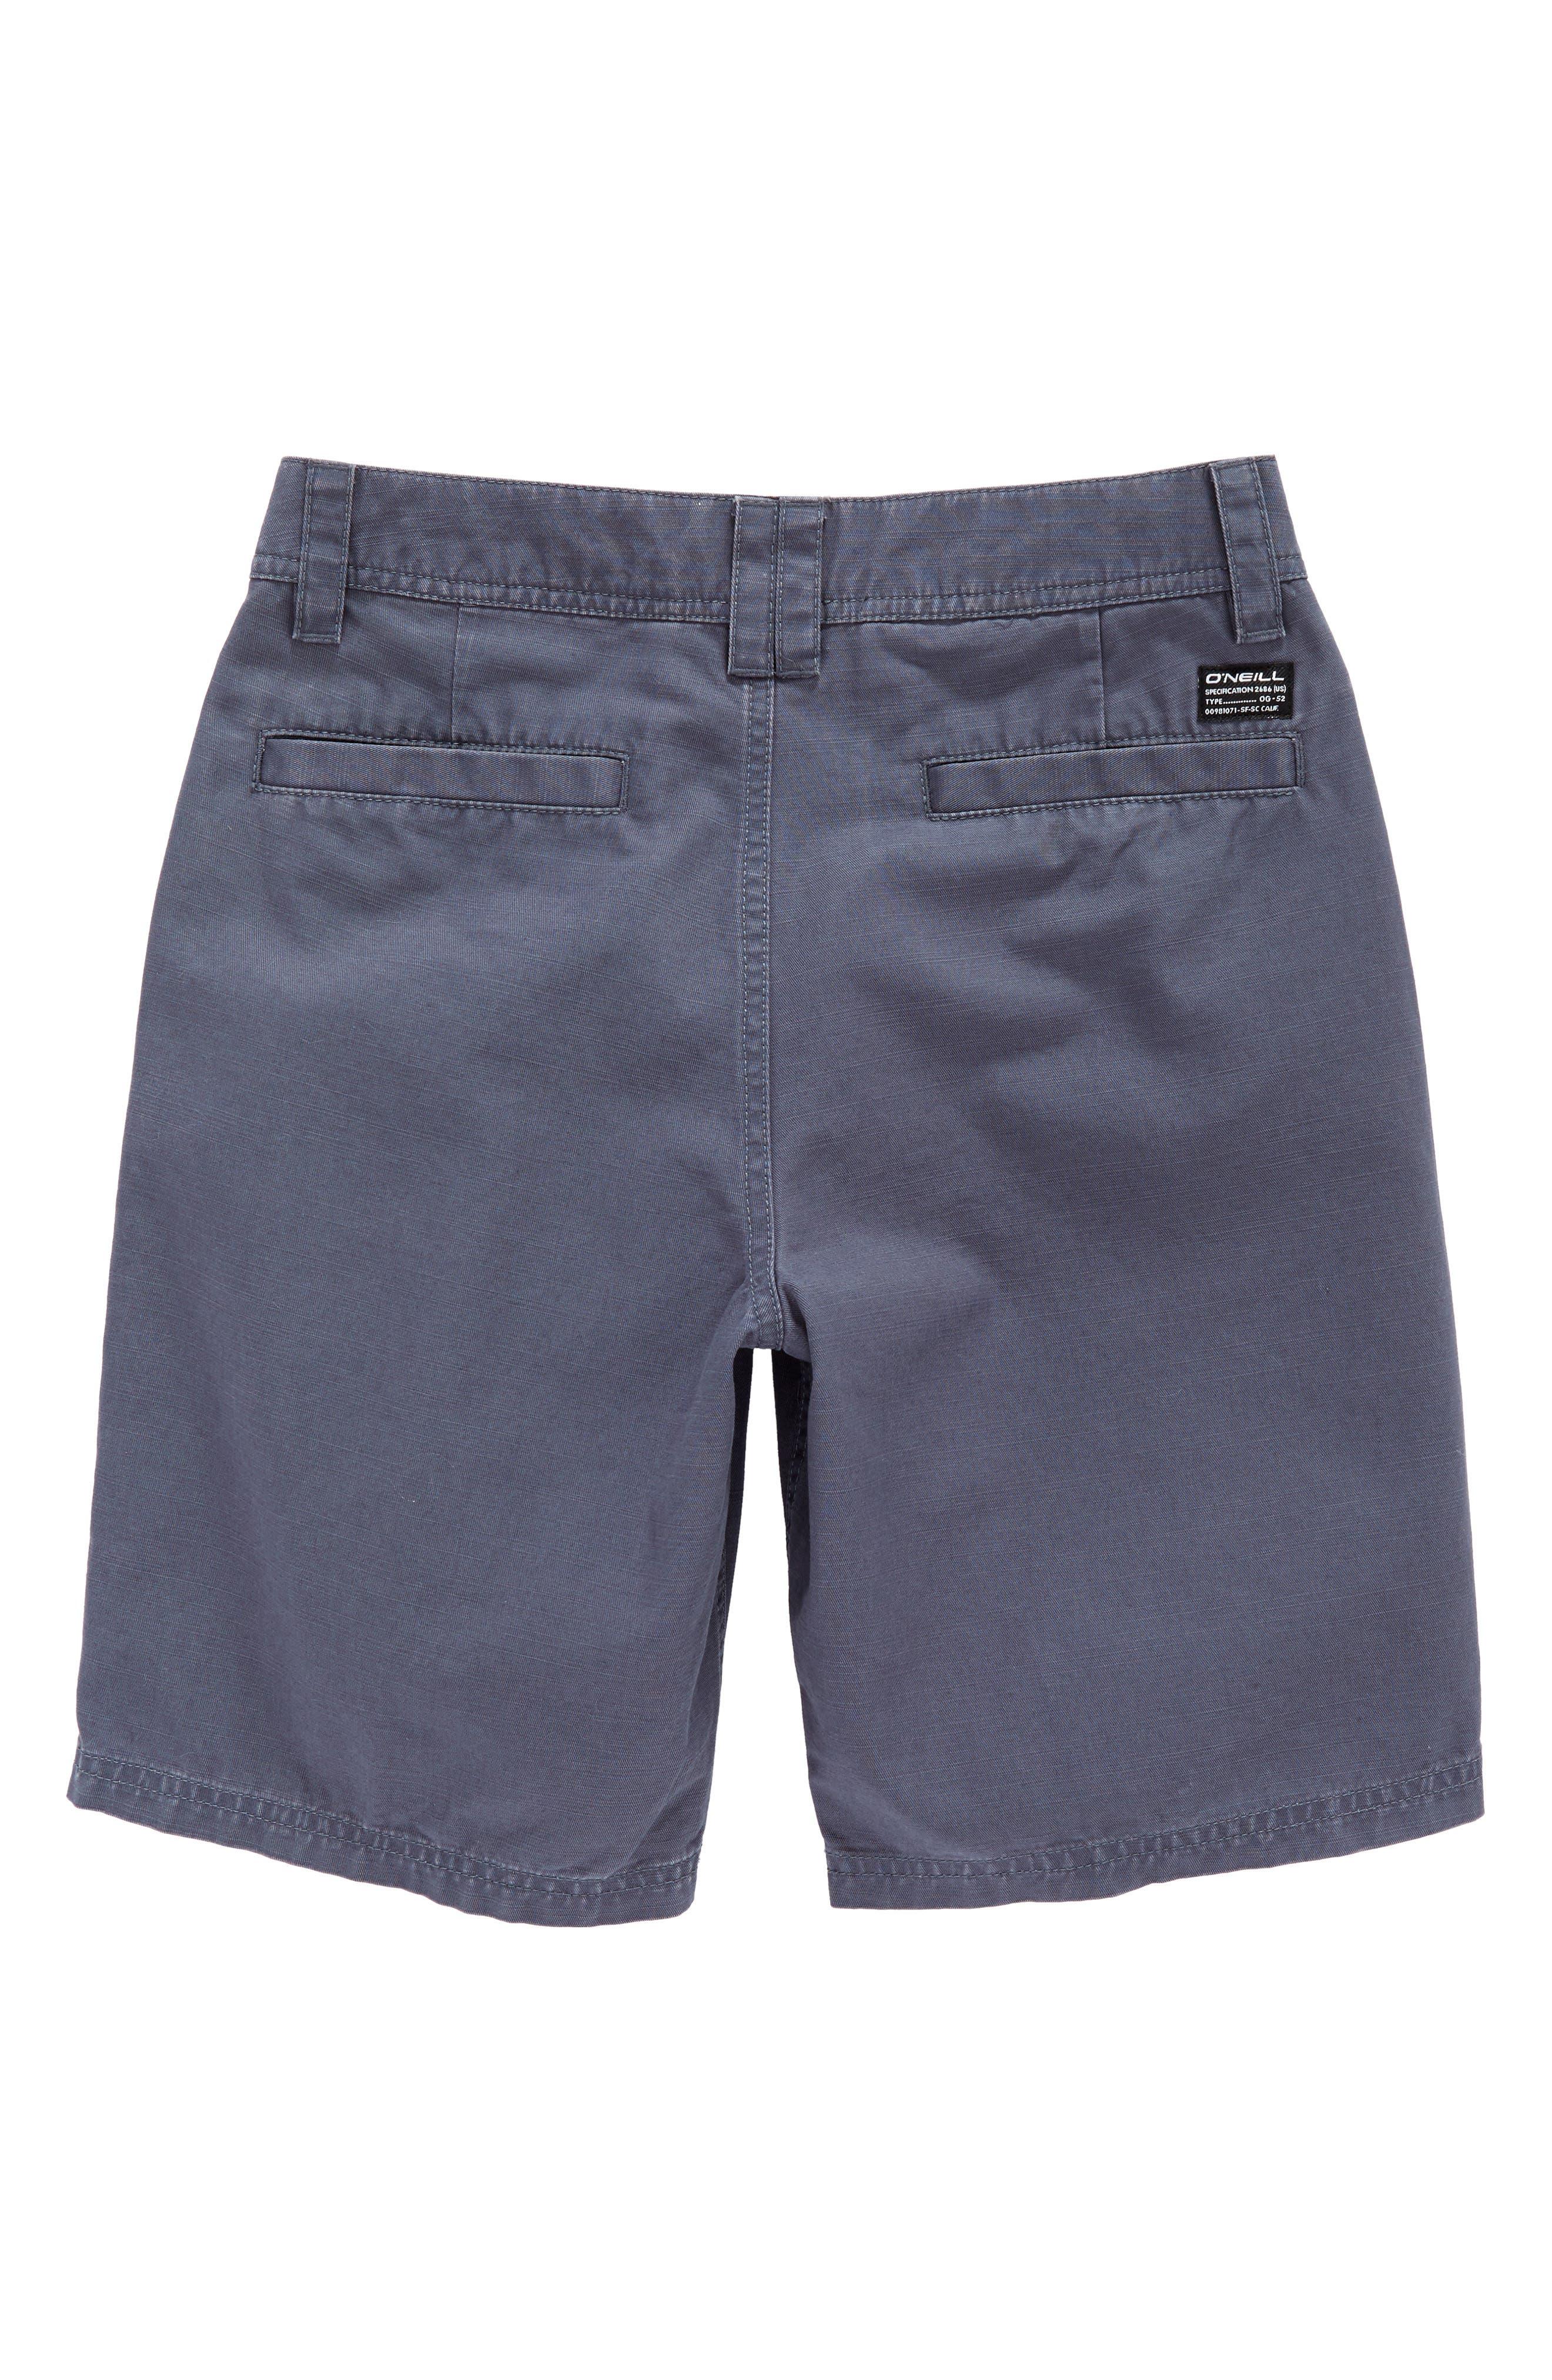 Jay Chino Shorts,                             Alternate thumbnail 2, color,                             Slate